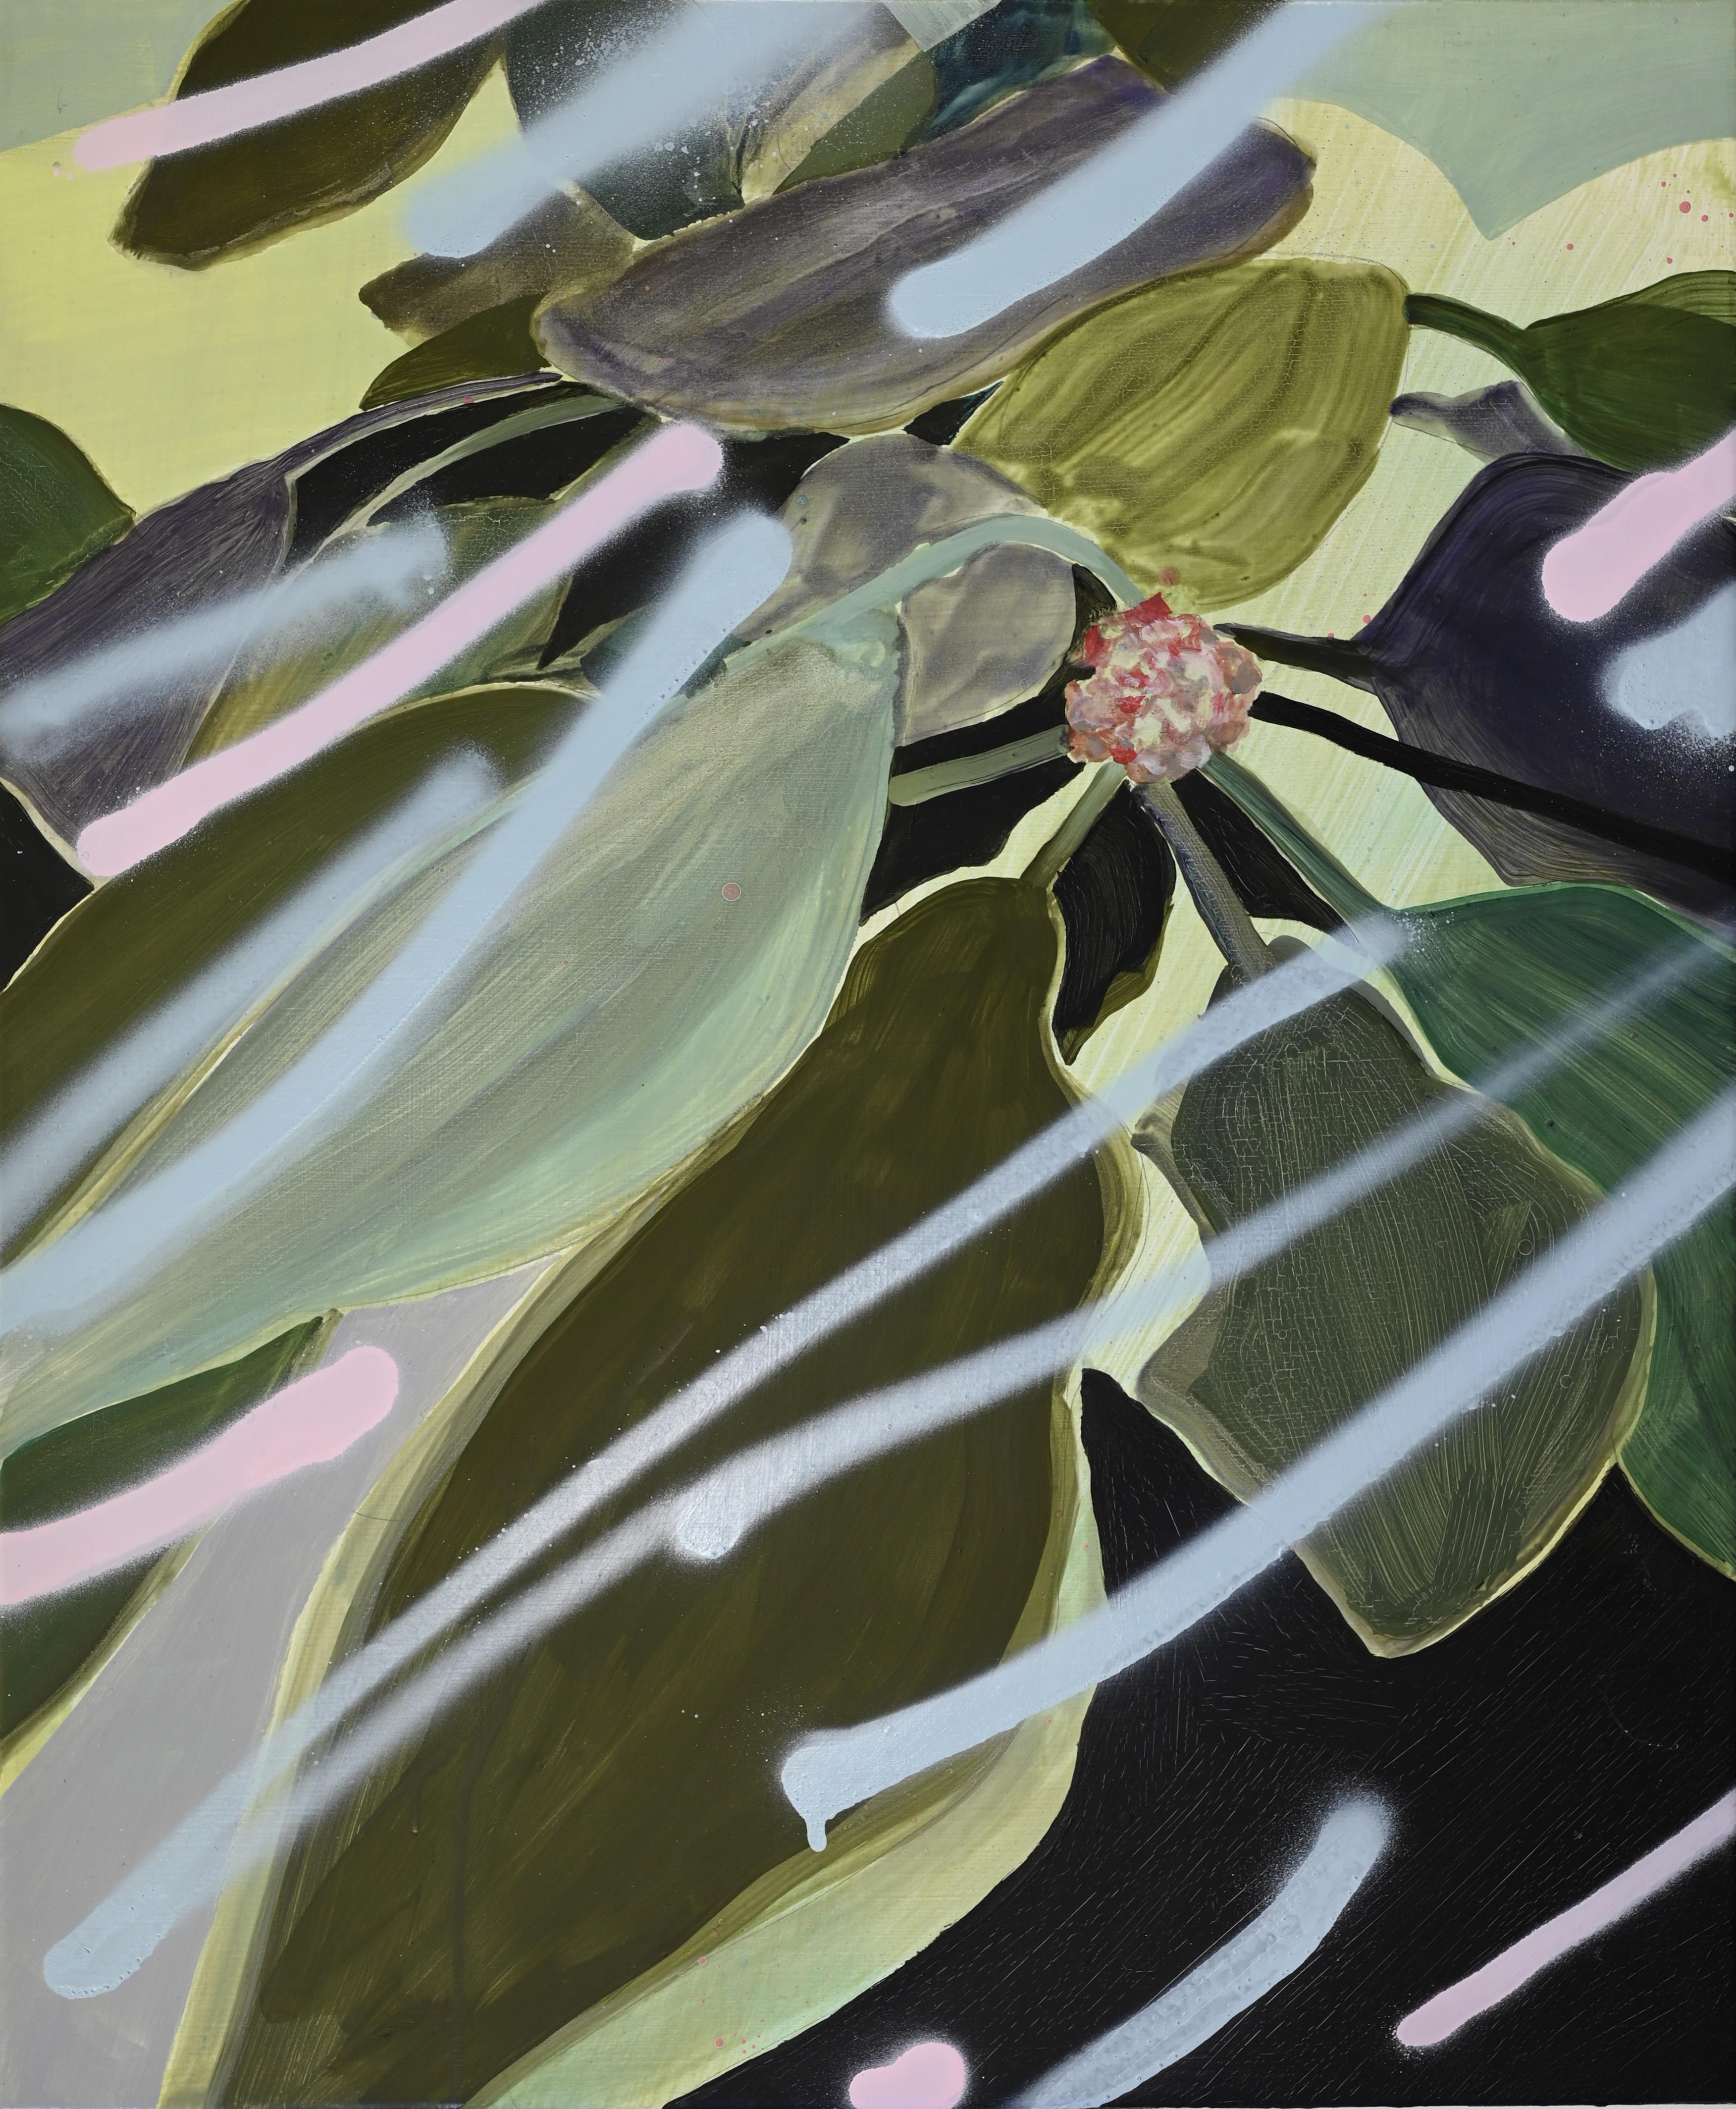 Una Ursprung(2)-Morning dew, Flowering plant#15